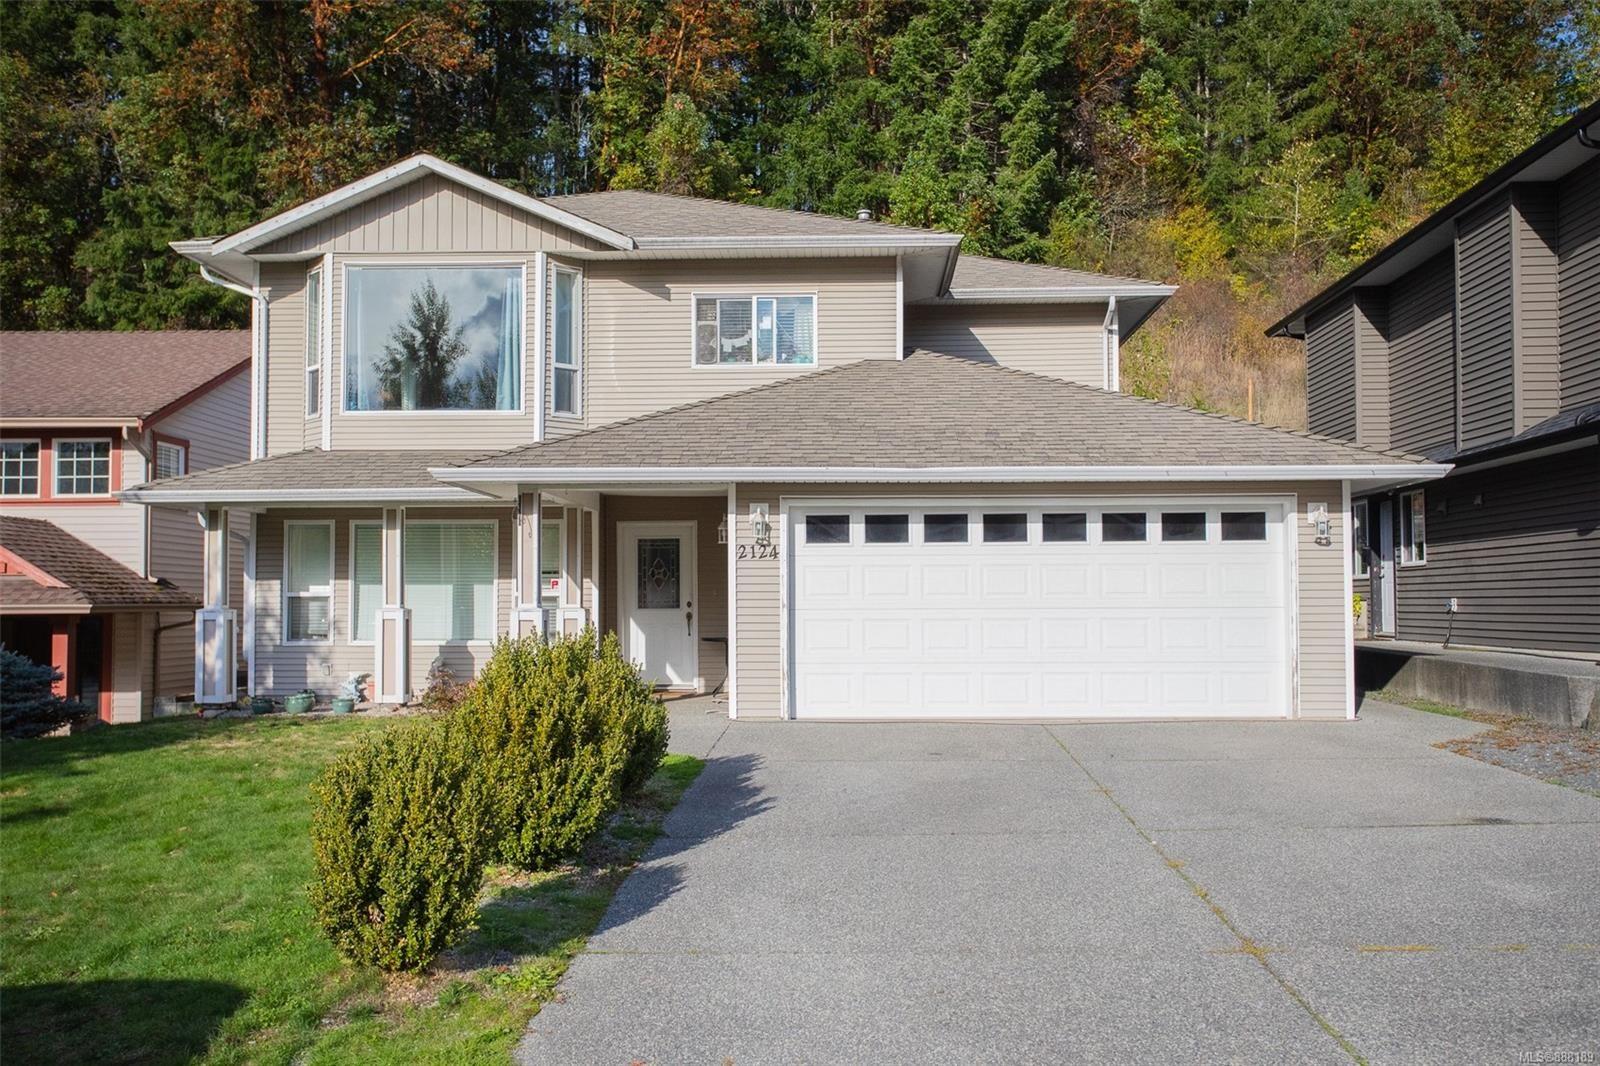 Main Photo: 2124 MOUNTAIN VISTA Dr in : Na Diver Lake House for sale (Nanaimo)  : MLS®# 888189